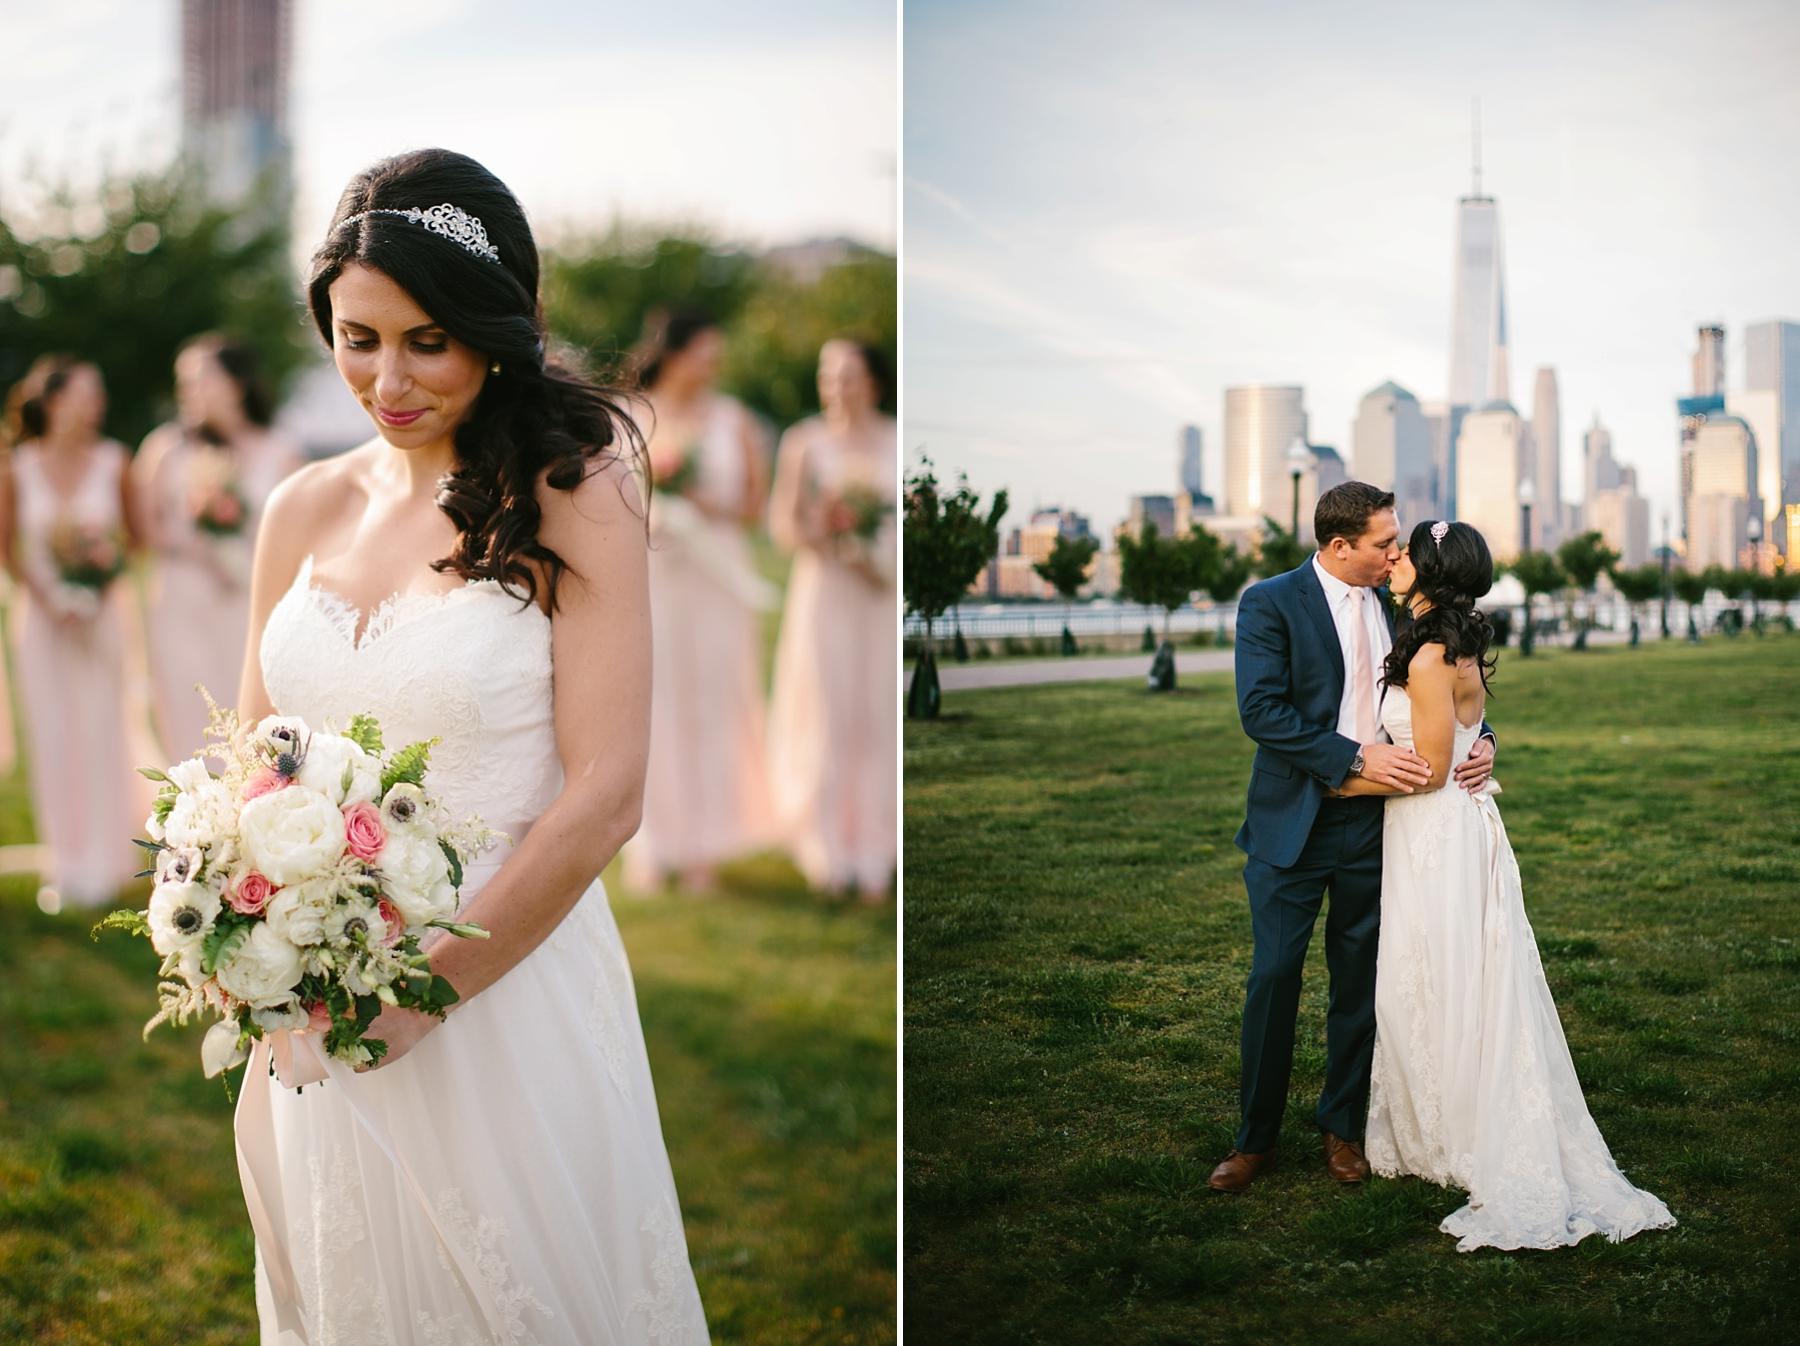 liberty-state-park-wedding-photographer-ny-nj_0027.jpg